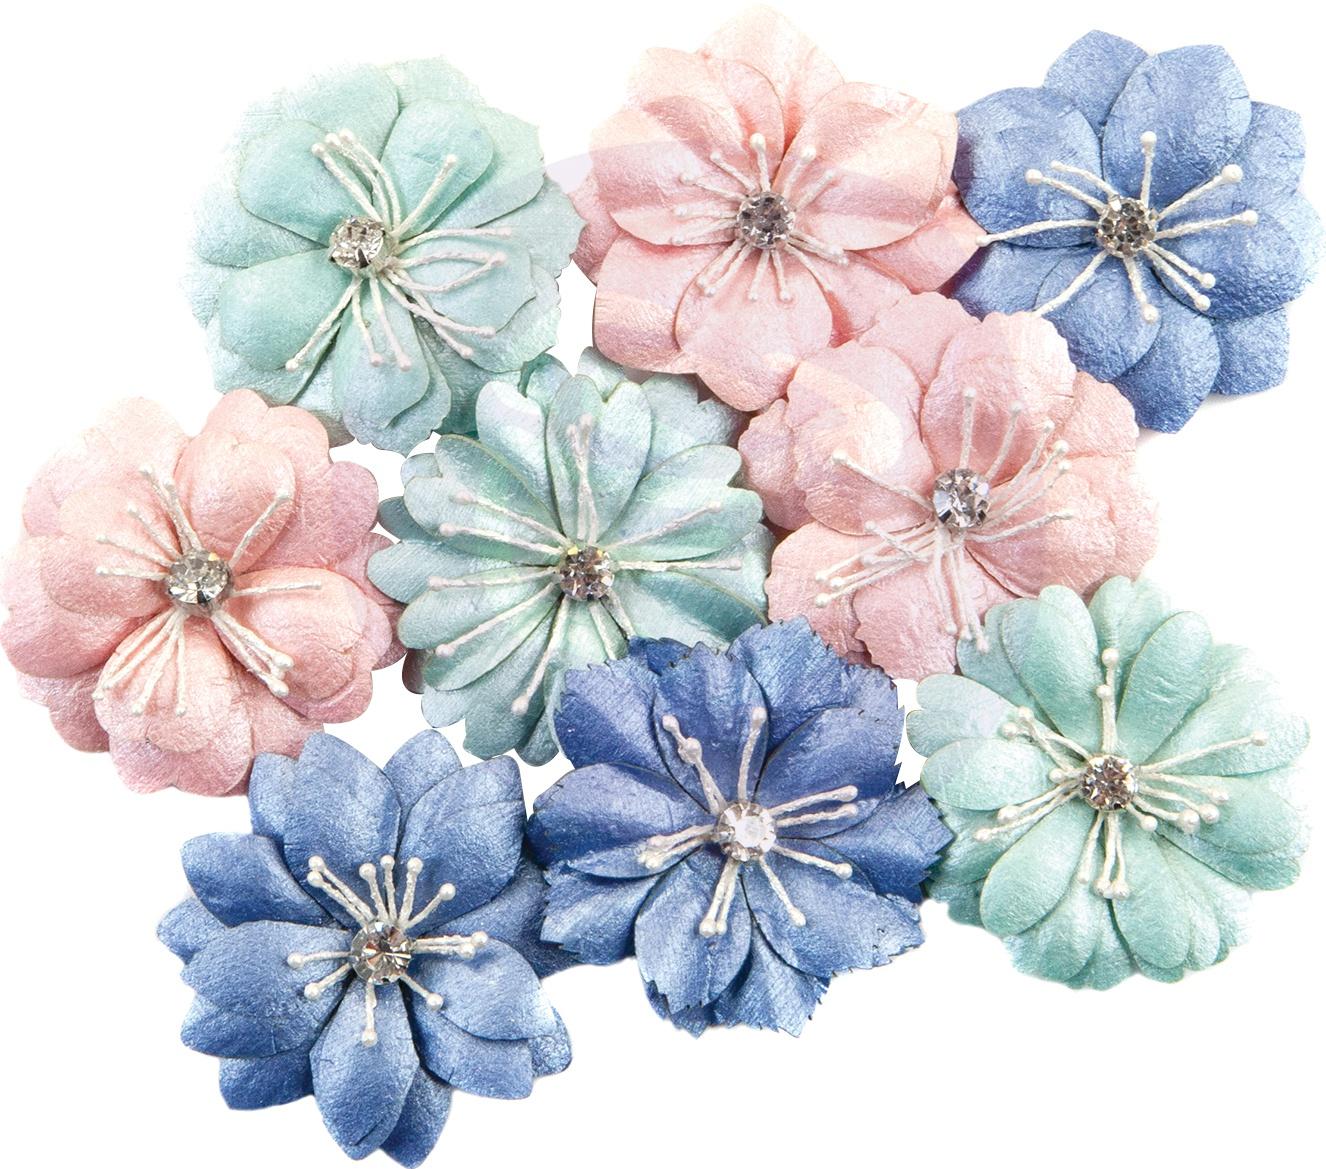 Prima Marketing Mulberry Paper Flowers  -Newport Bliss/Golden Coast, 9/Pkg